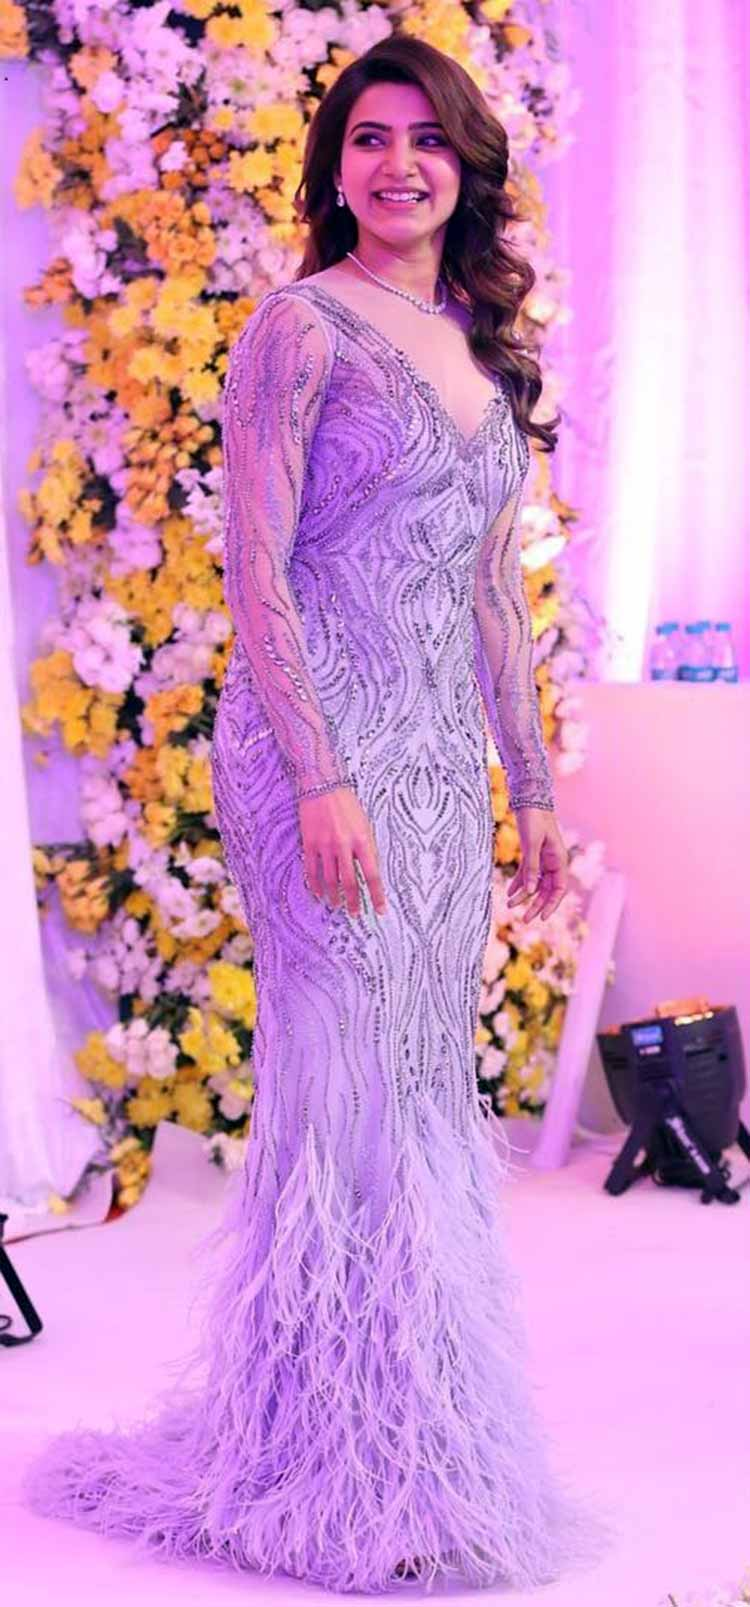 It's a wedding season wrap for the gorgeous Samantha Ruth Prabhu